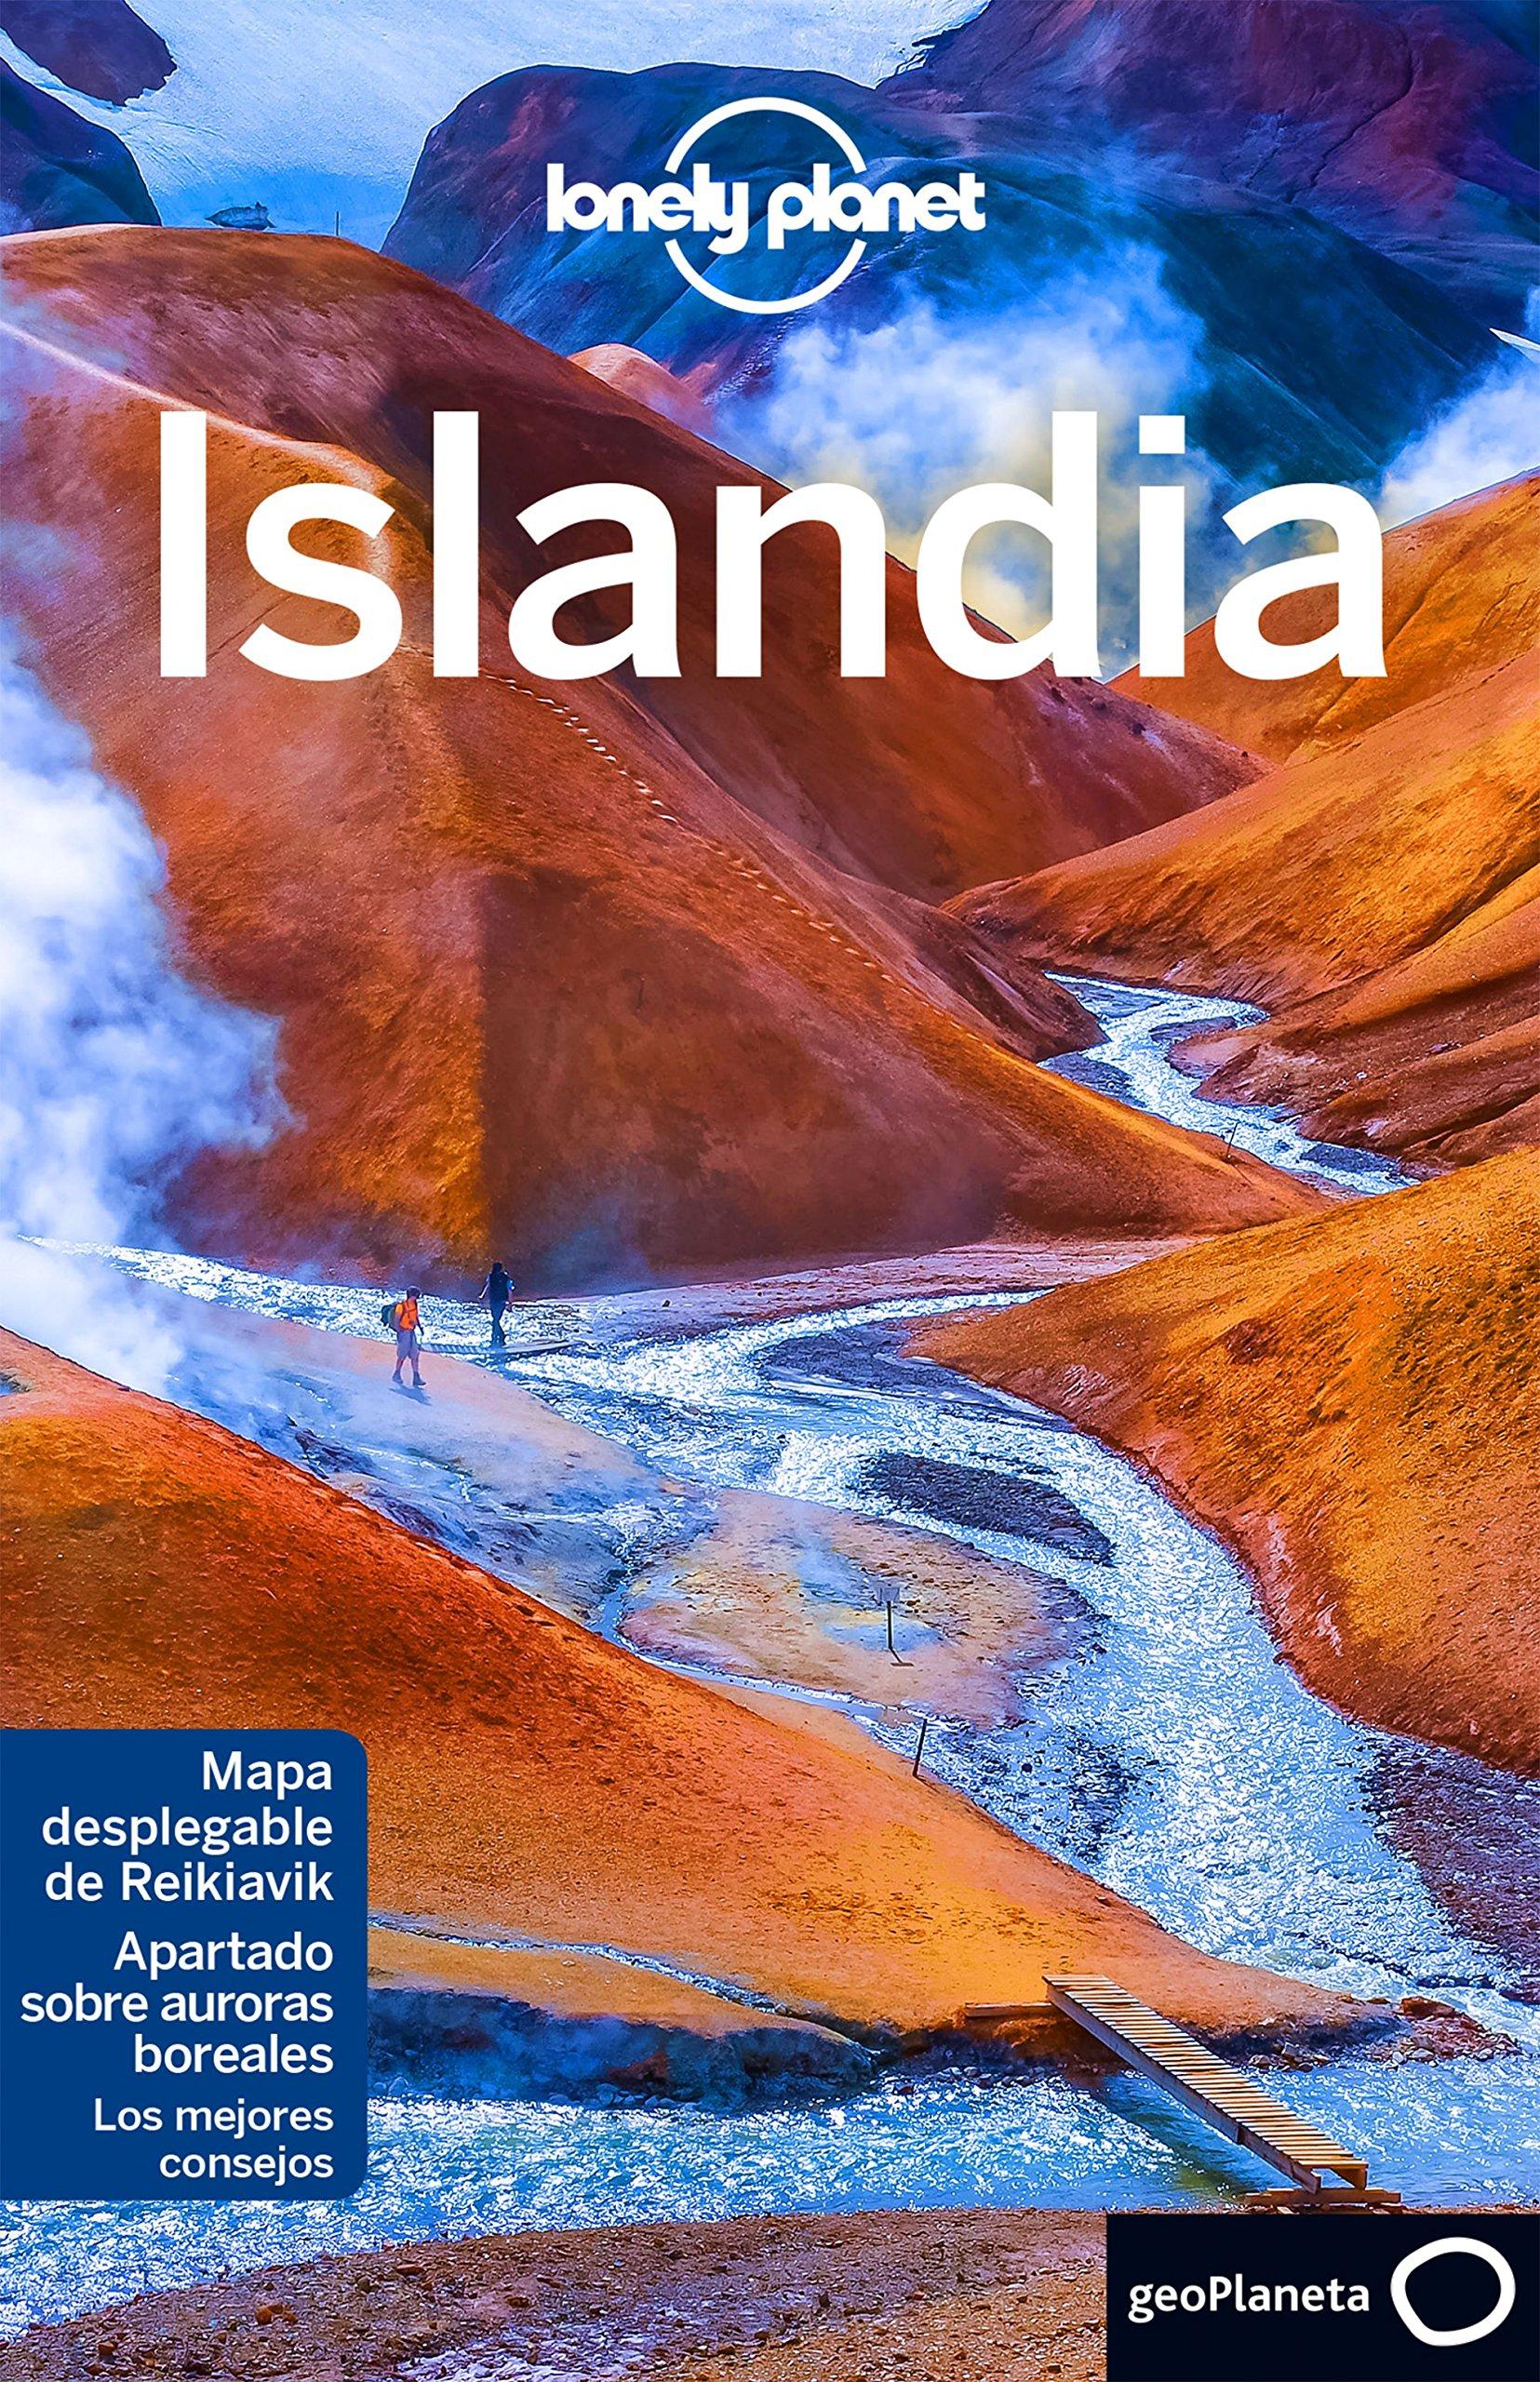 Islandia 4 (Guías de País Lonely Planet): Amazon.es: Bain, Carolyn, Averbuck, Alexis, Ros González, Miguel, Boladeras Usón, Àlex, Moreno Parrado, Silvia: Libros